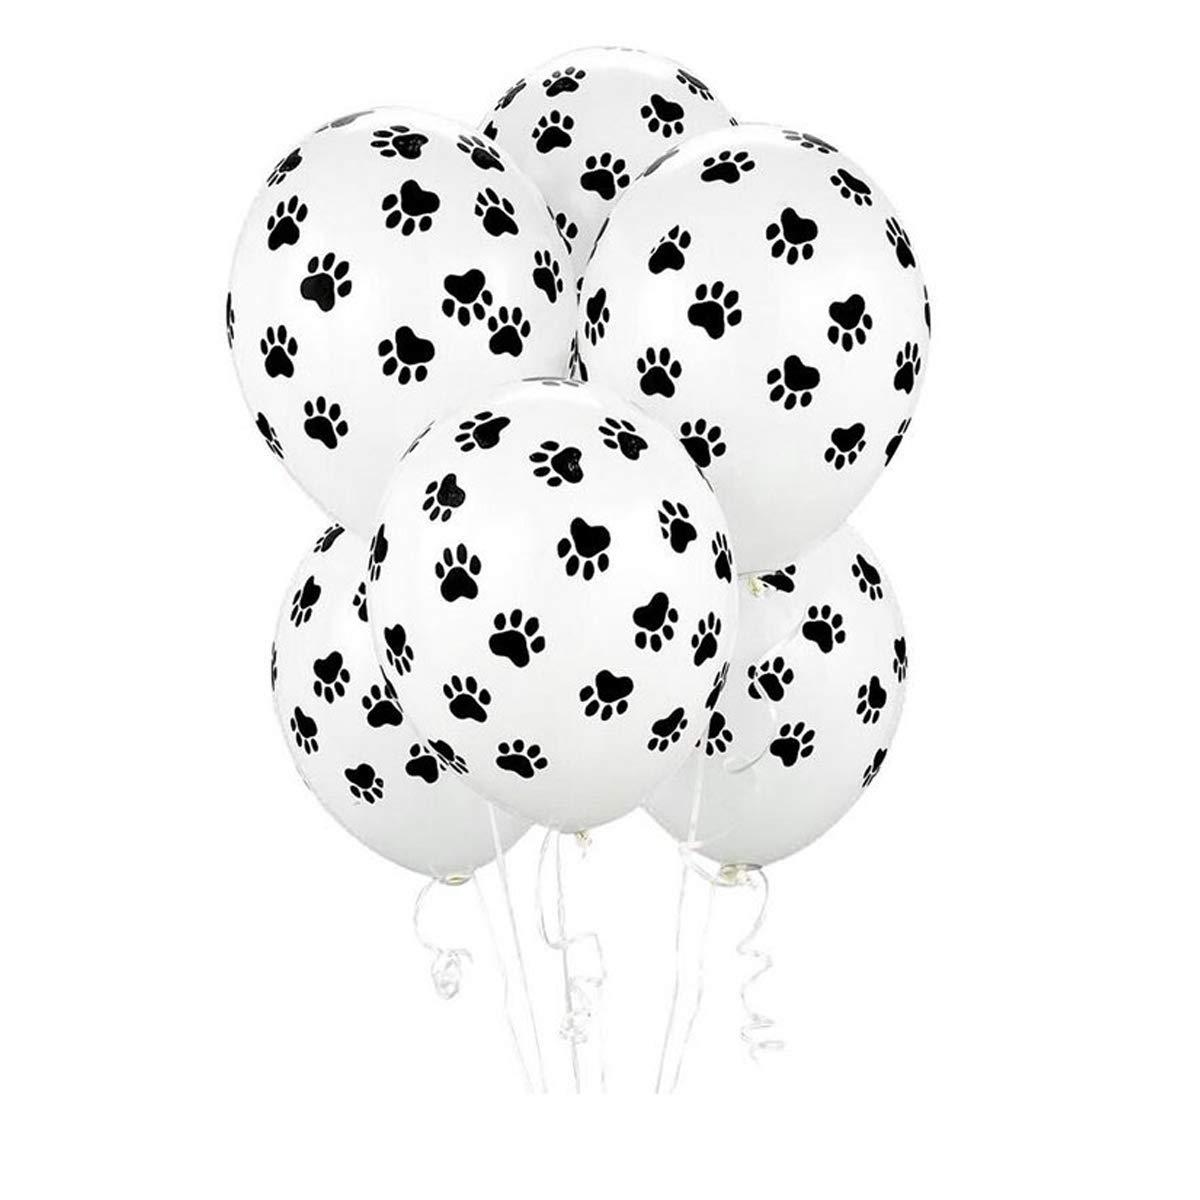 Sc0nni 25Pcs Cute Dog Footprints Print Balloons For Birthday Party